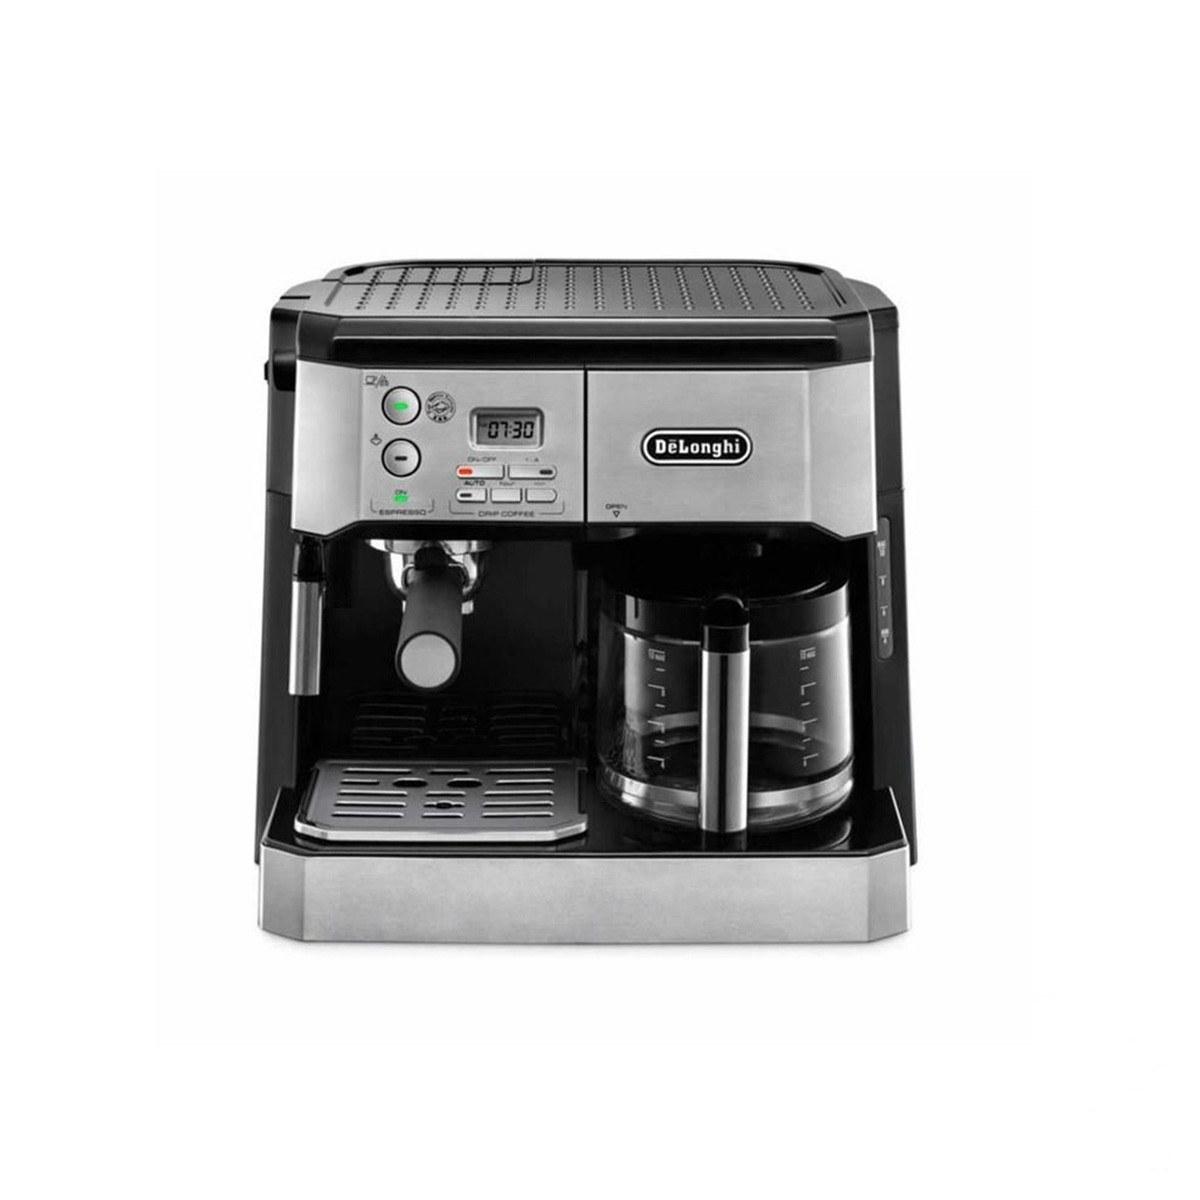 تصویر اسپرسو ساز دلونگی 1750 وات BCO421 Delonghi BCO421 Delonghi Espresso Maker 1750w